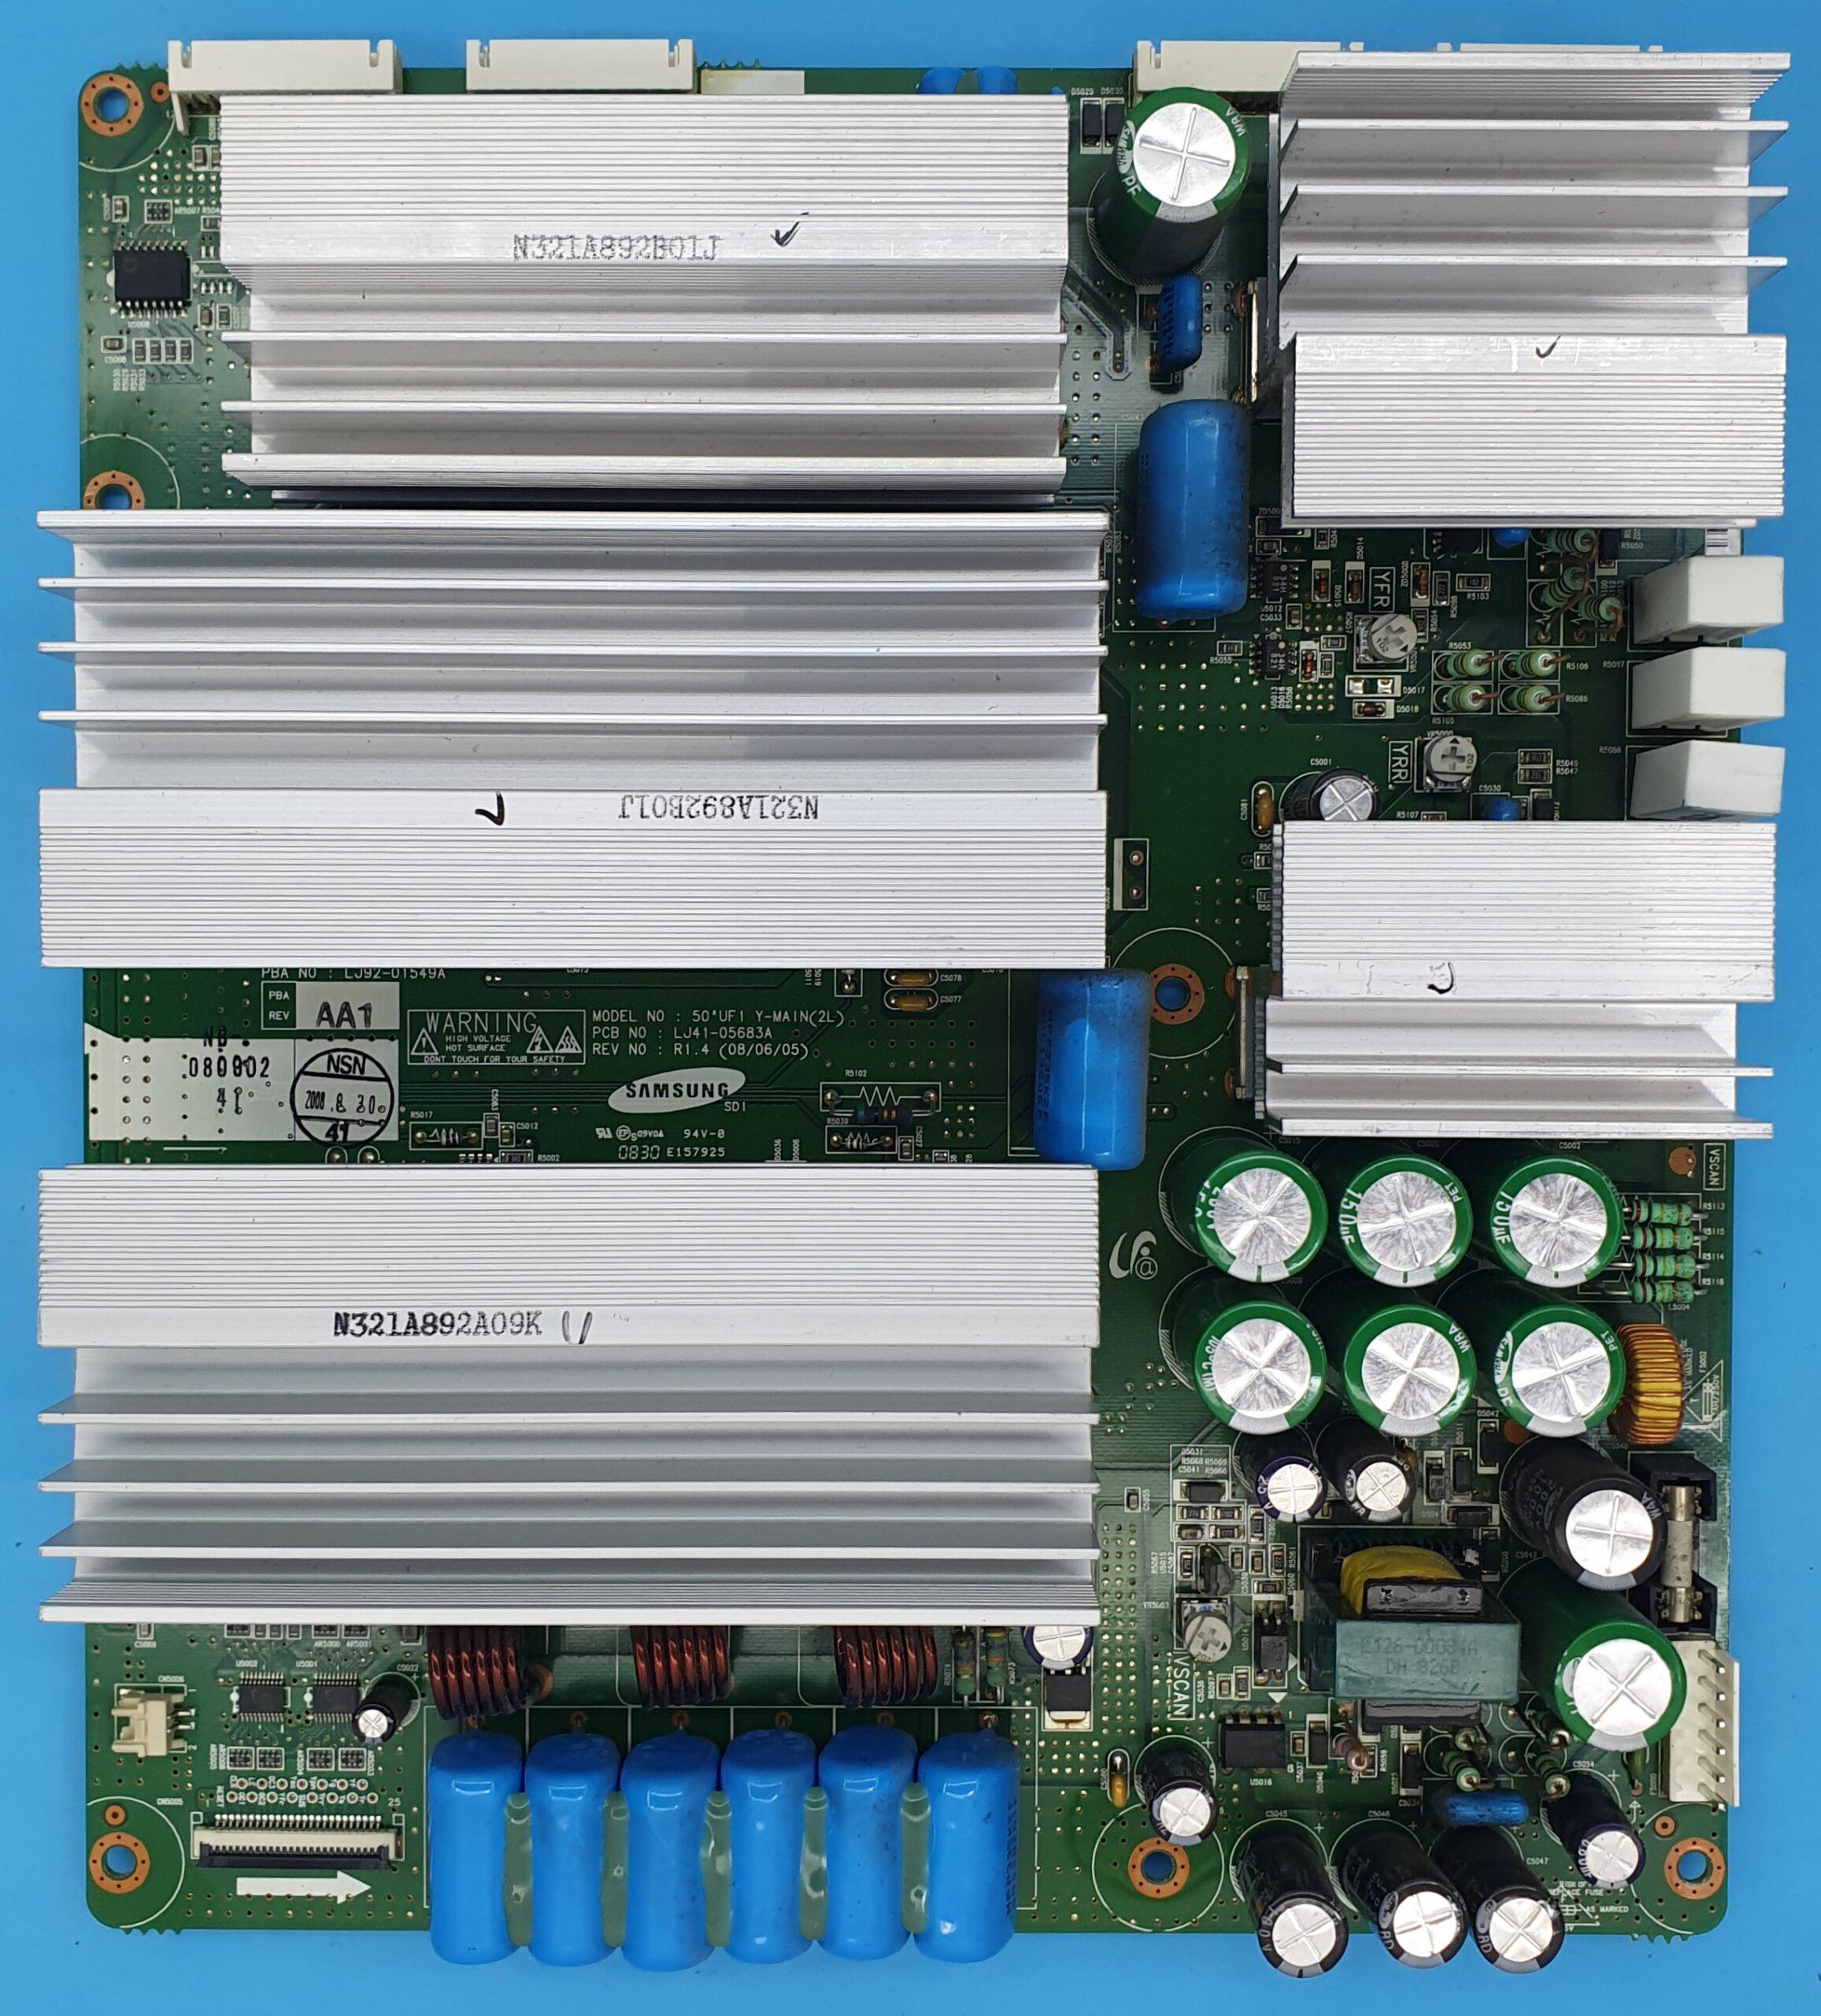 LJ41-05683A SAMSUNG Y-SUS (KDV DAHİL = 150 TL)